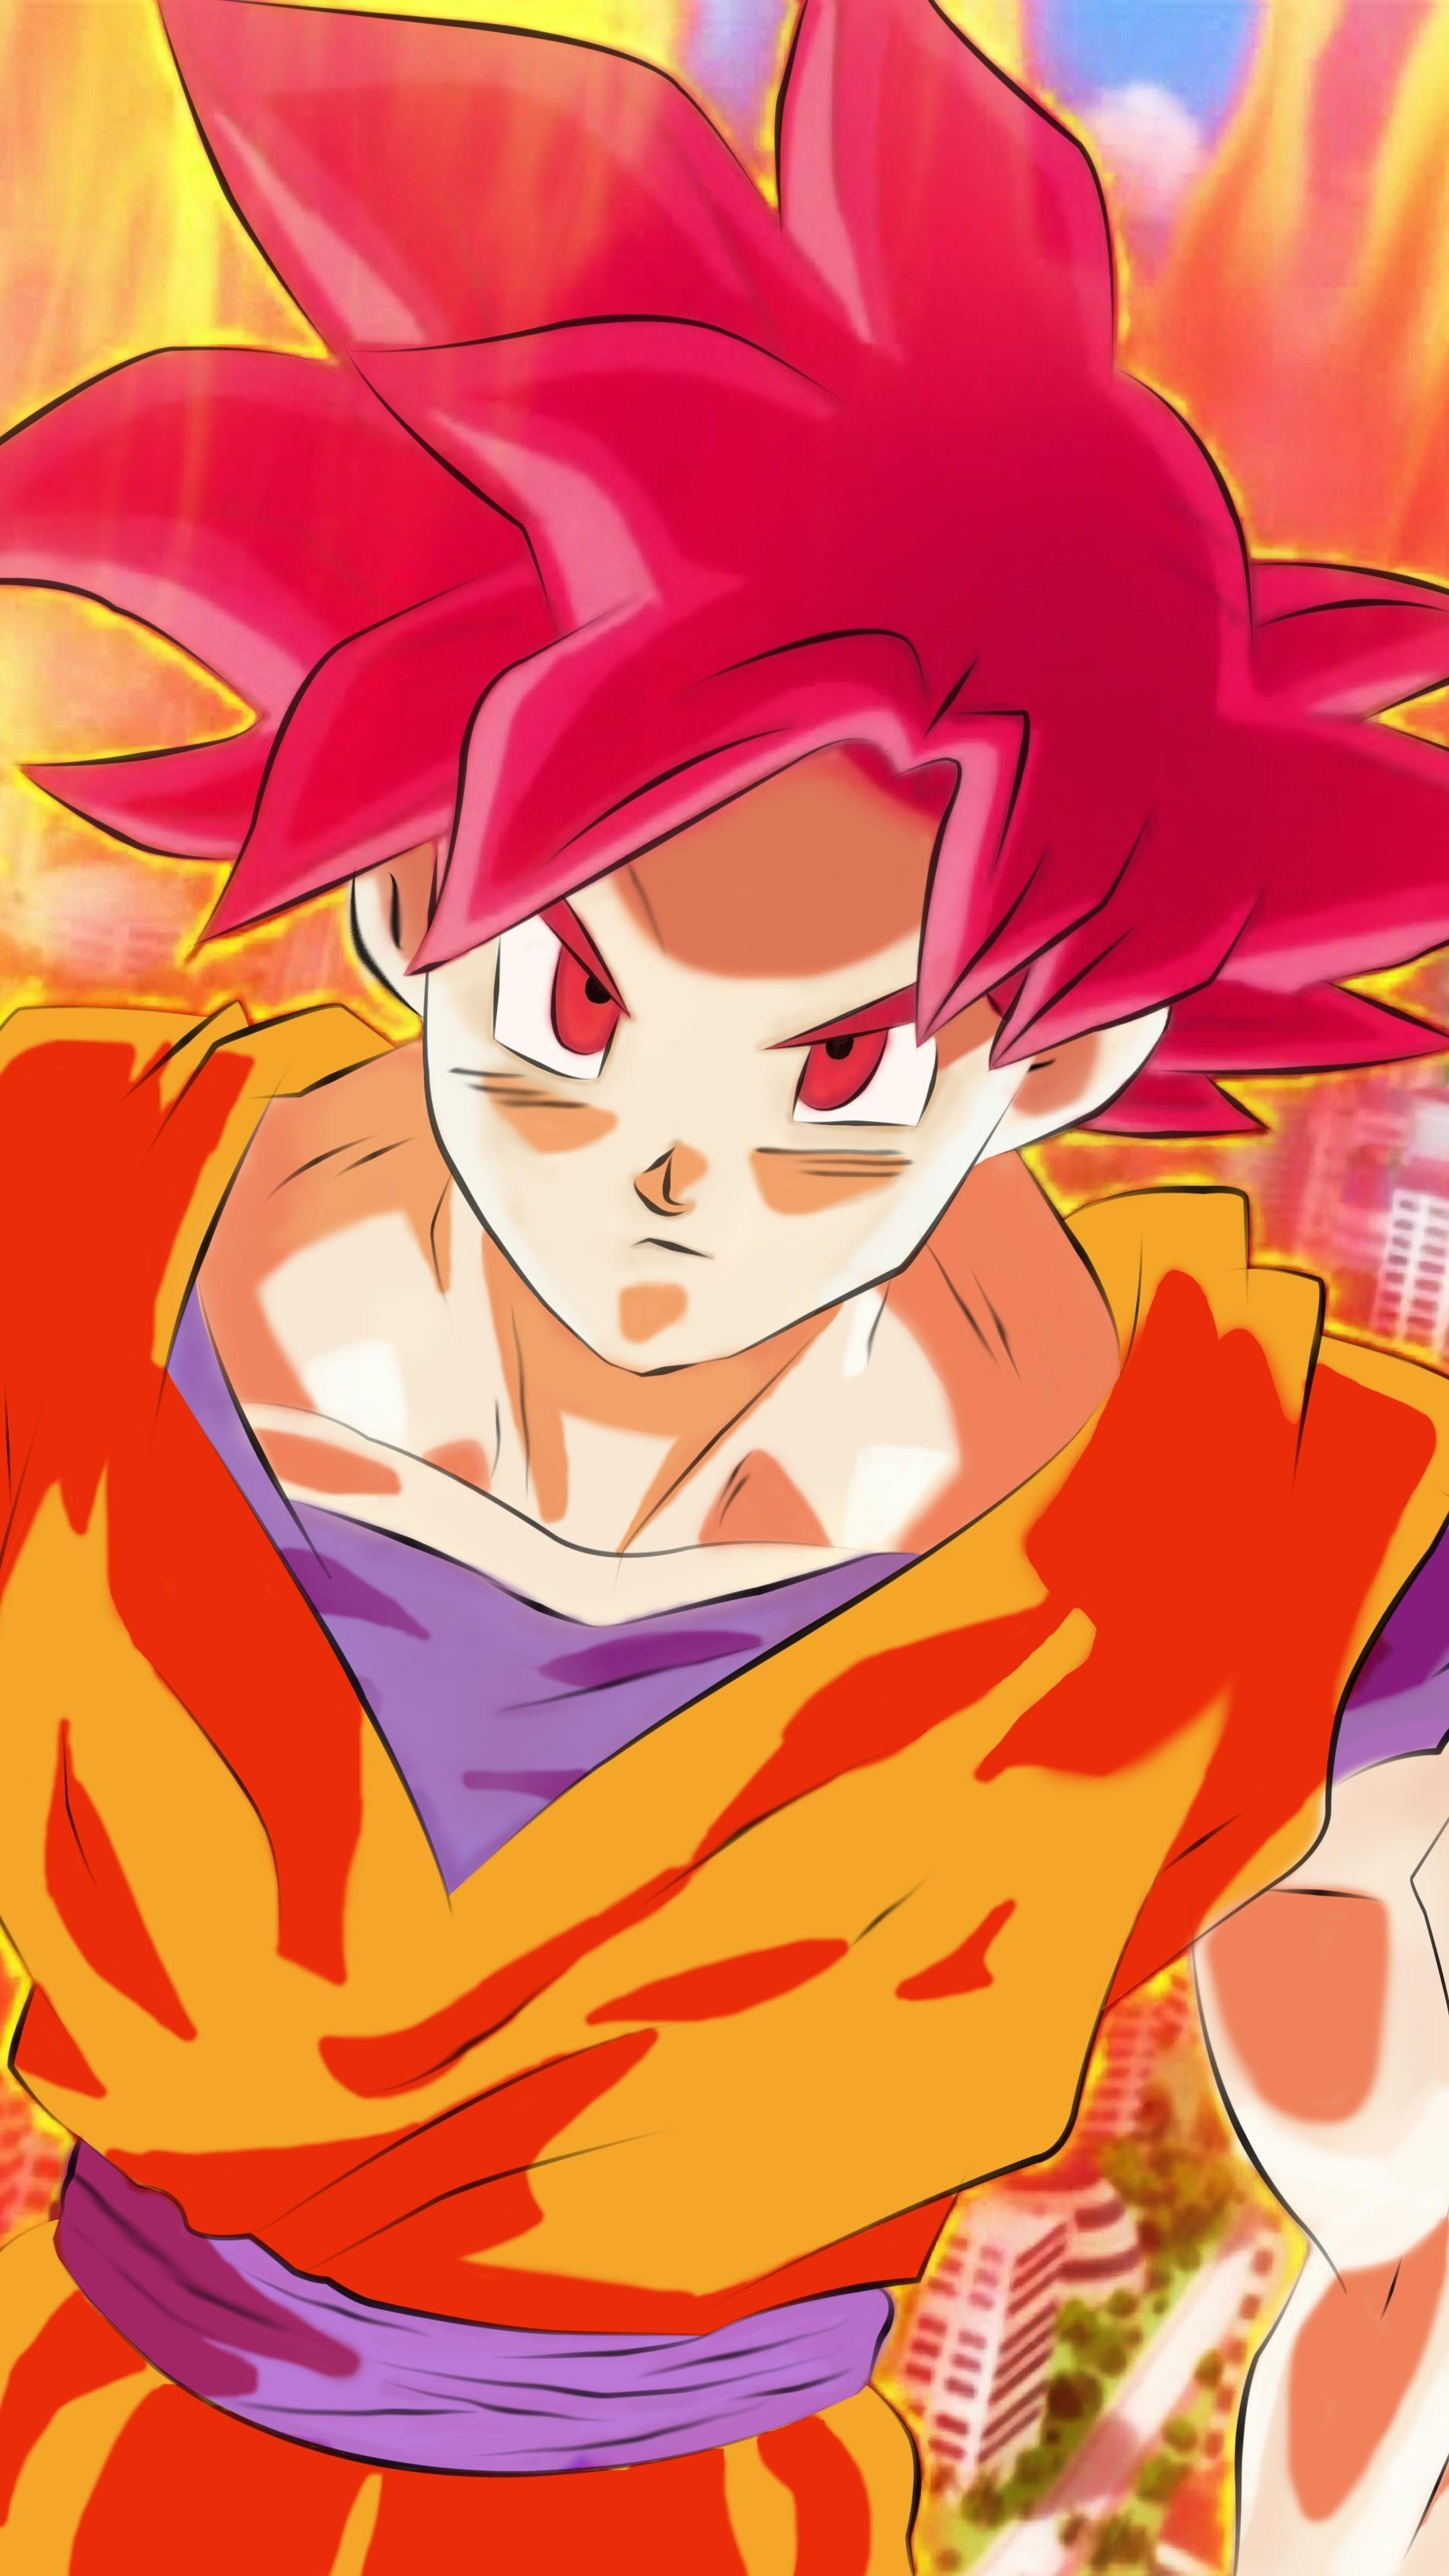 Super Saiyan God Goku Wallpaper 71+ images